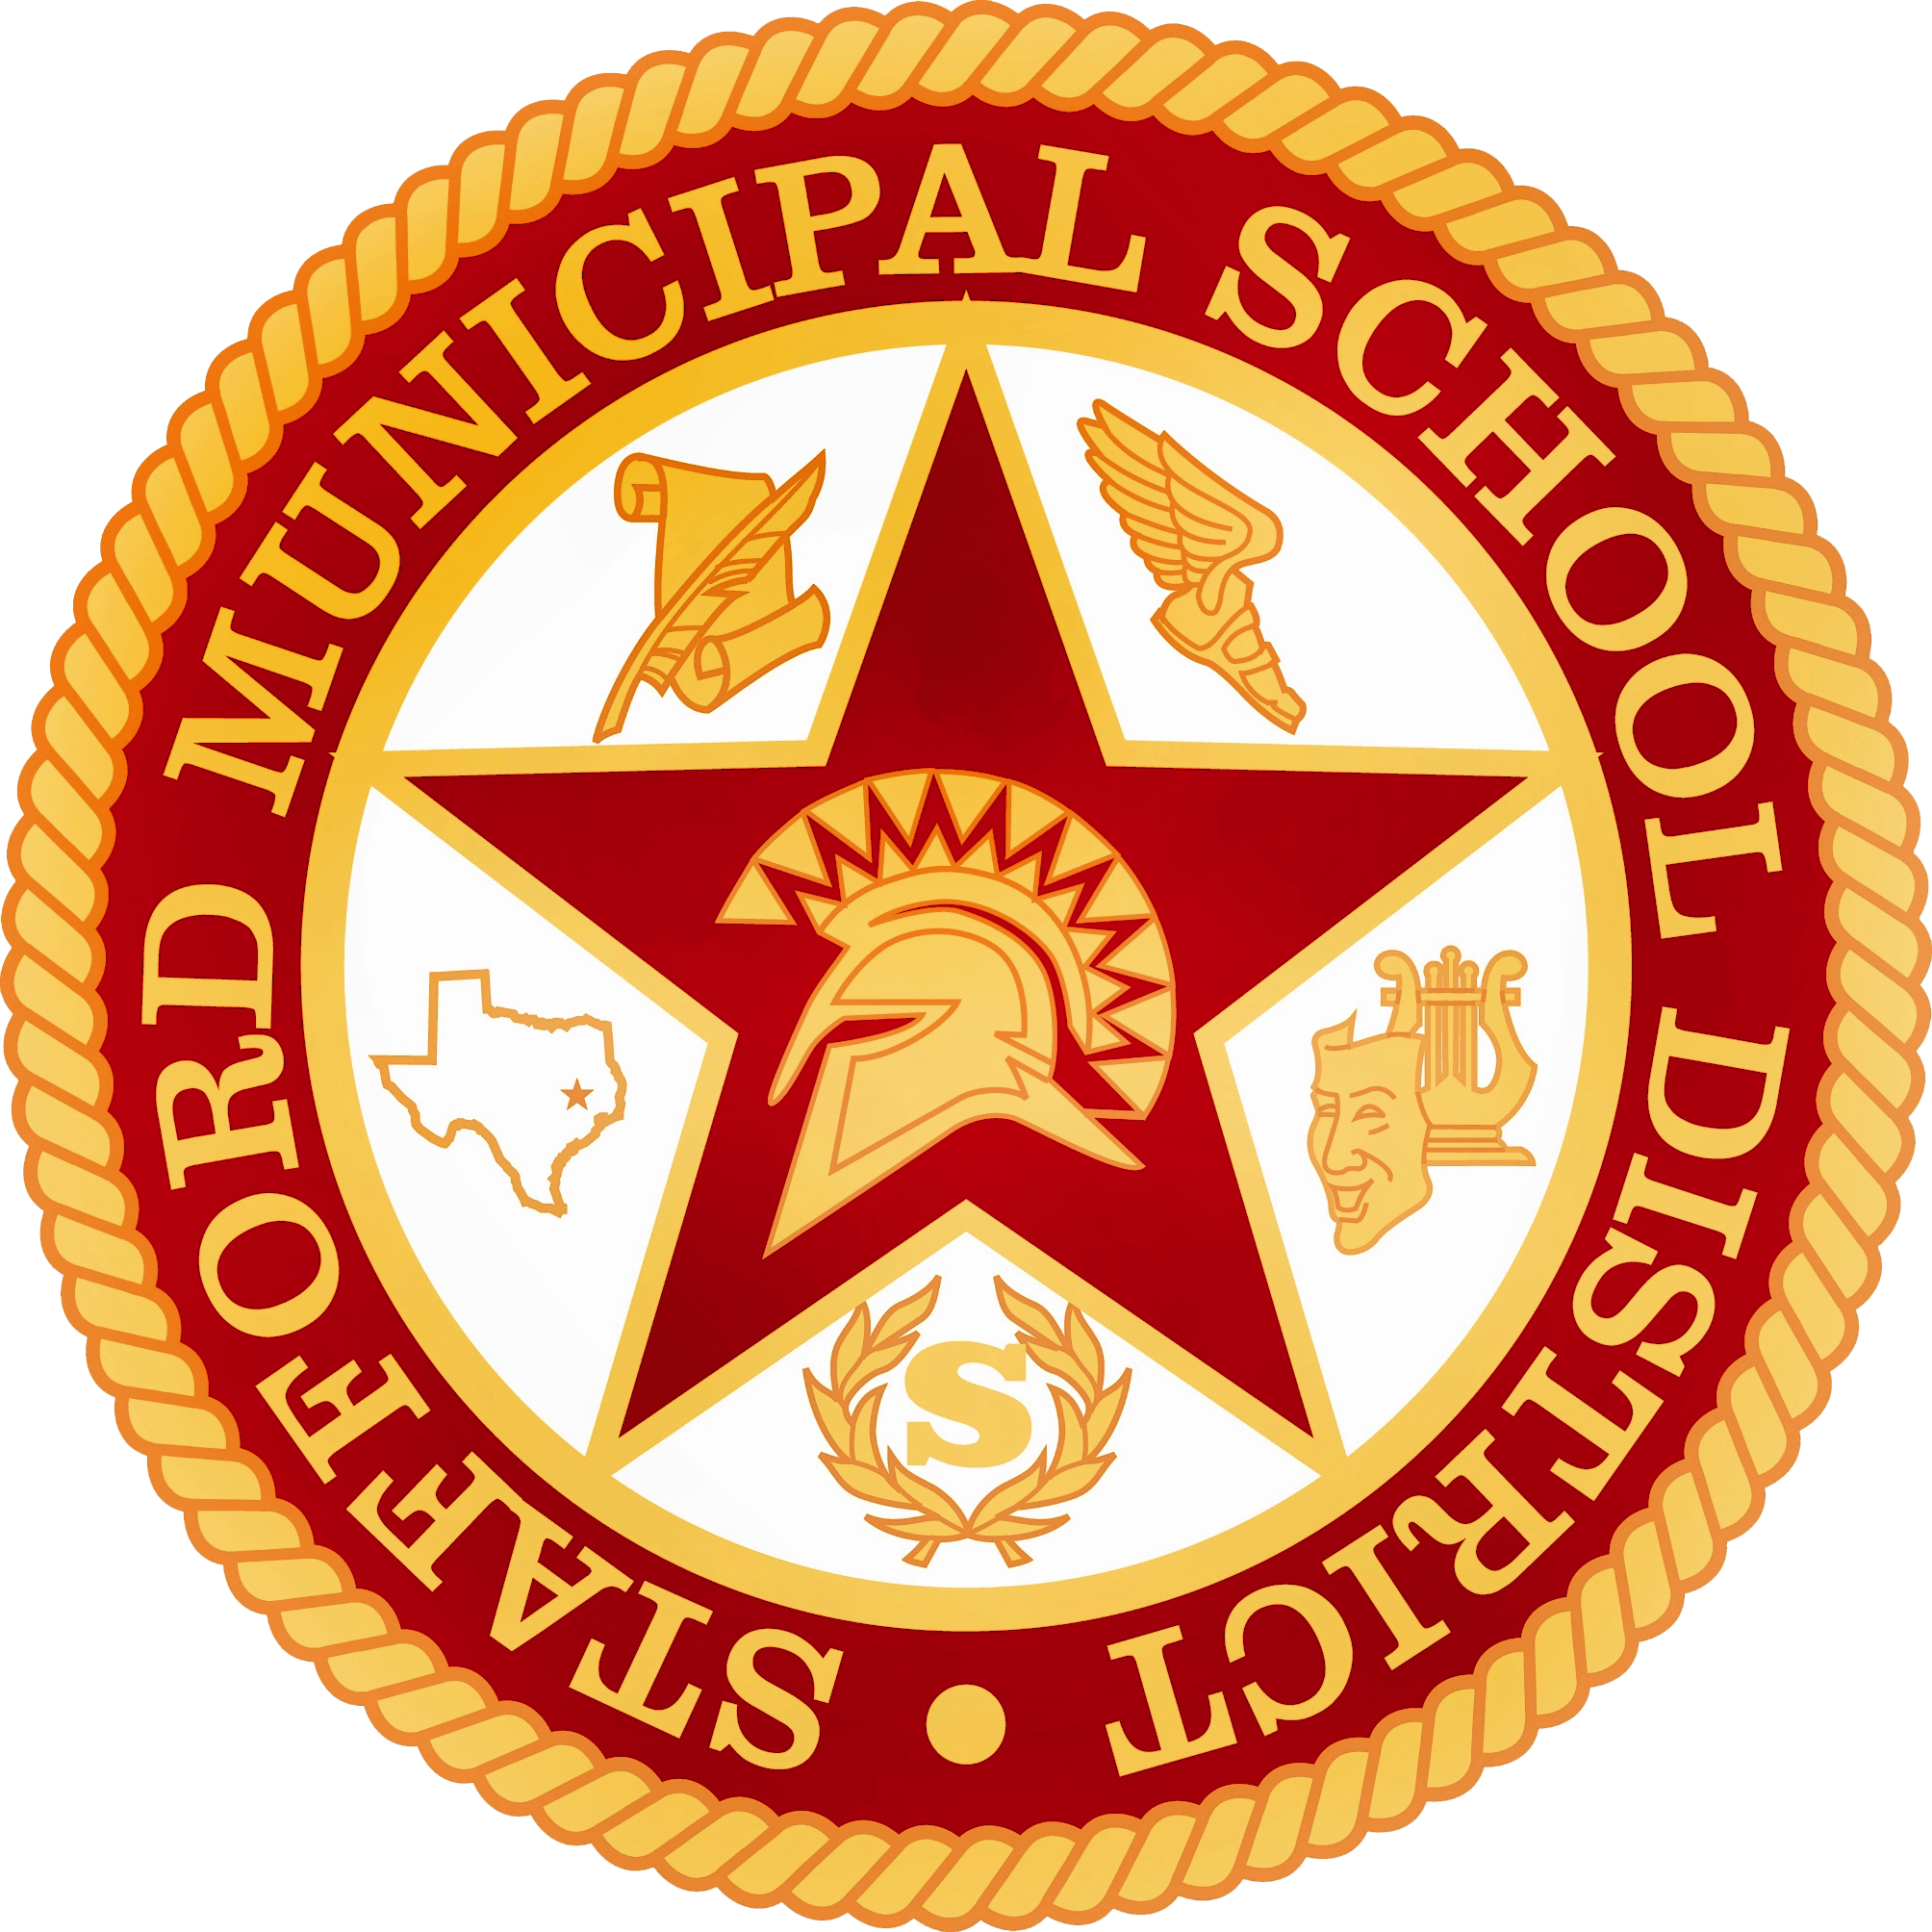 Stafford Municipal School District